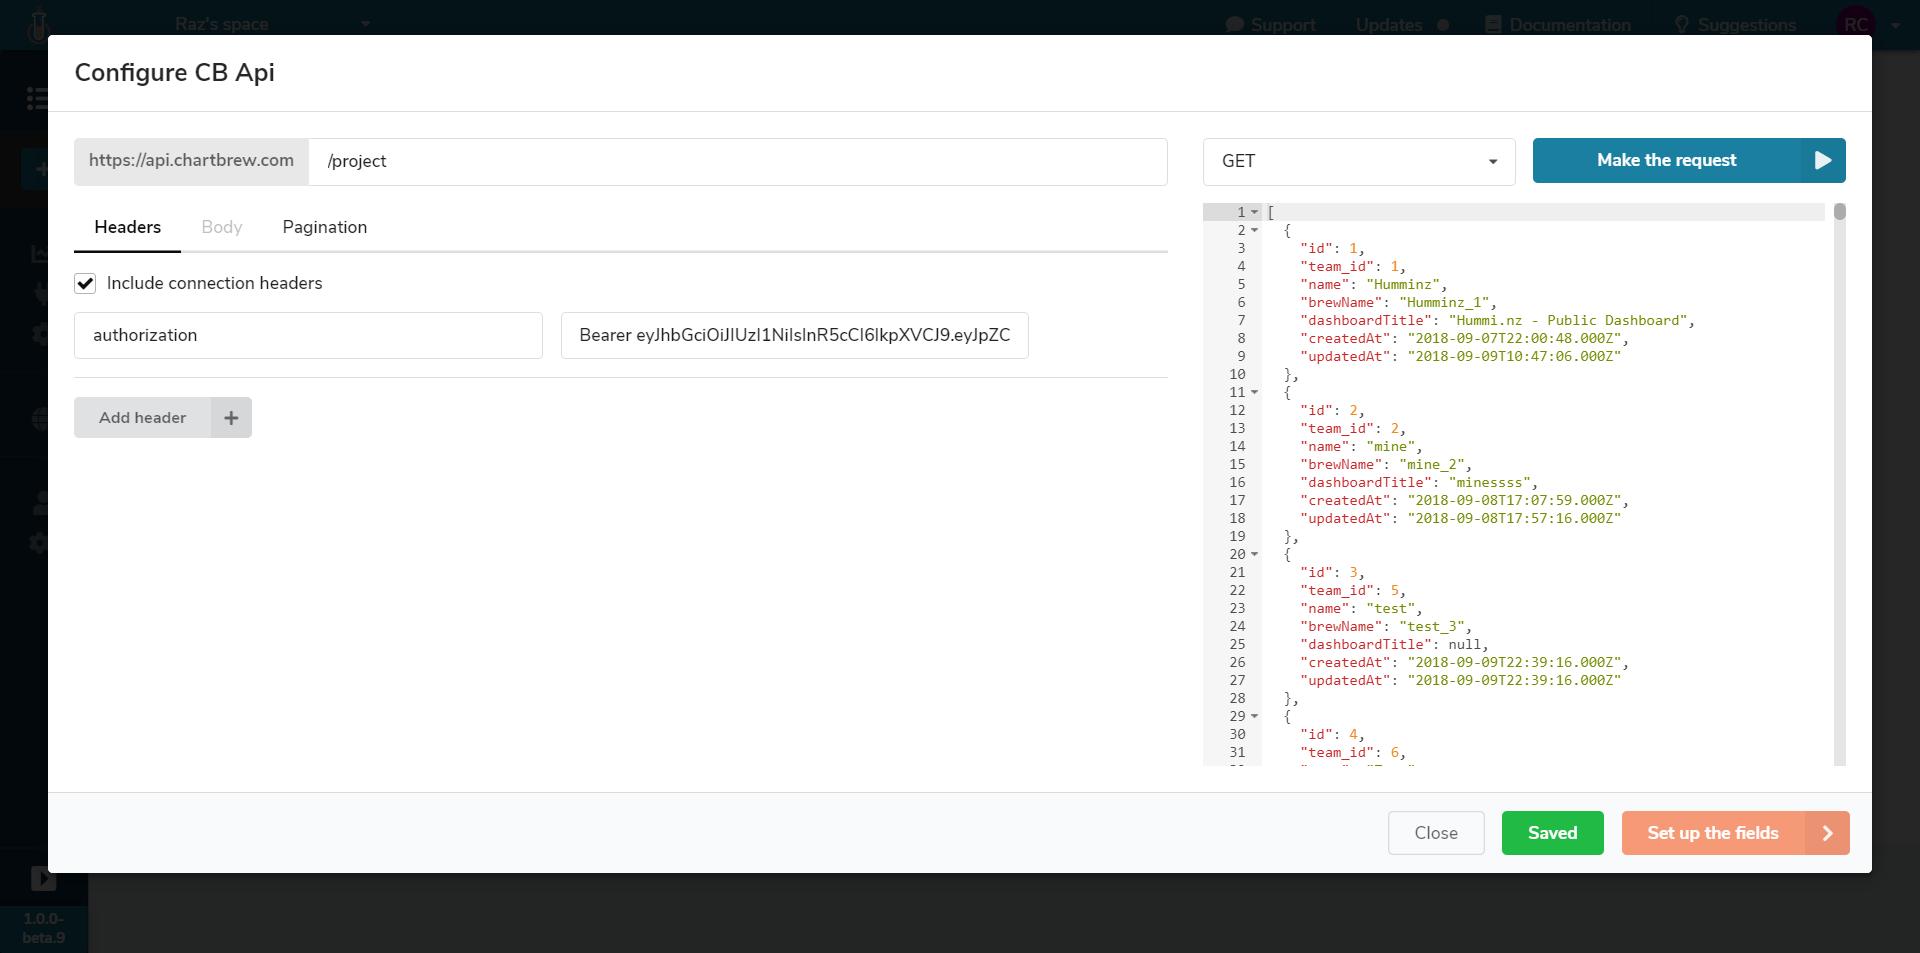 Chartbrew API configuration